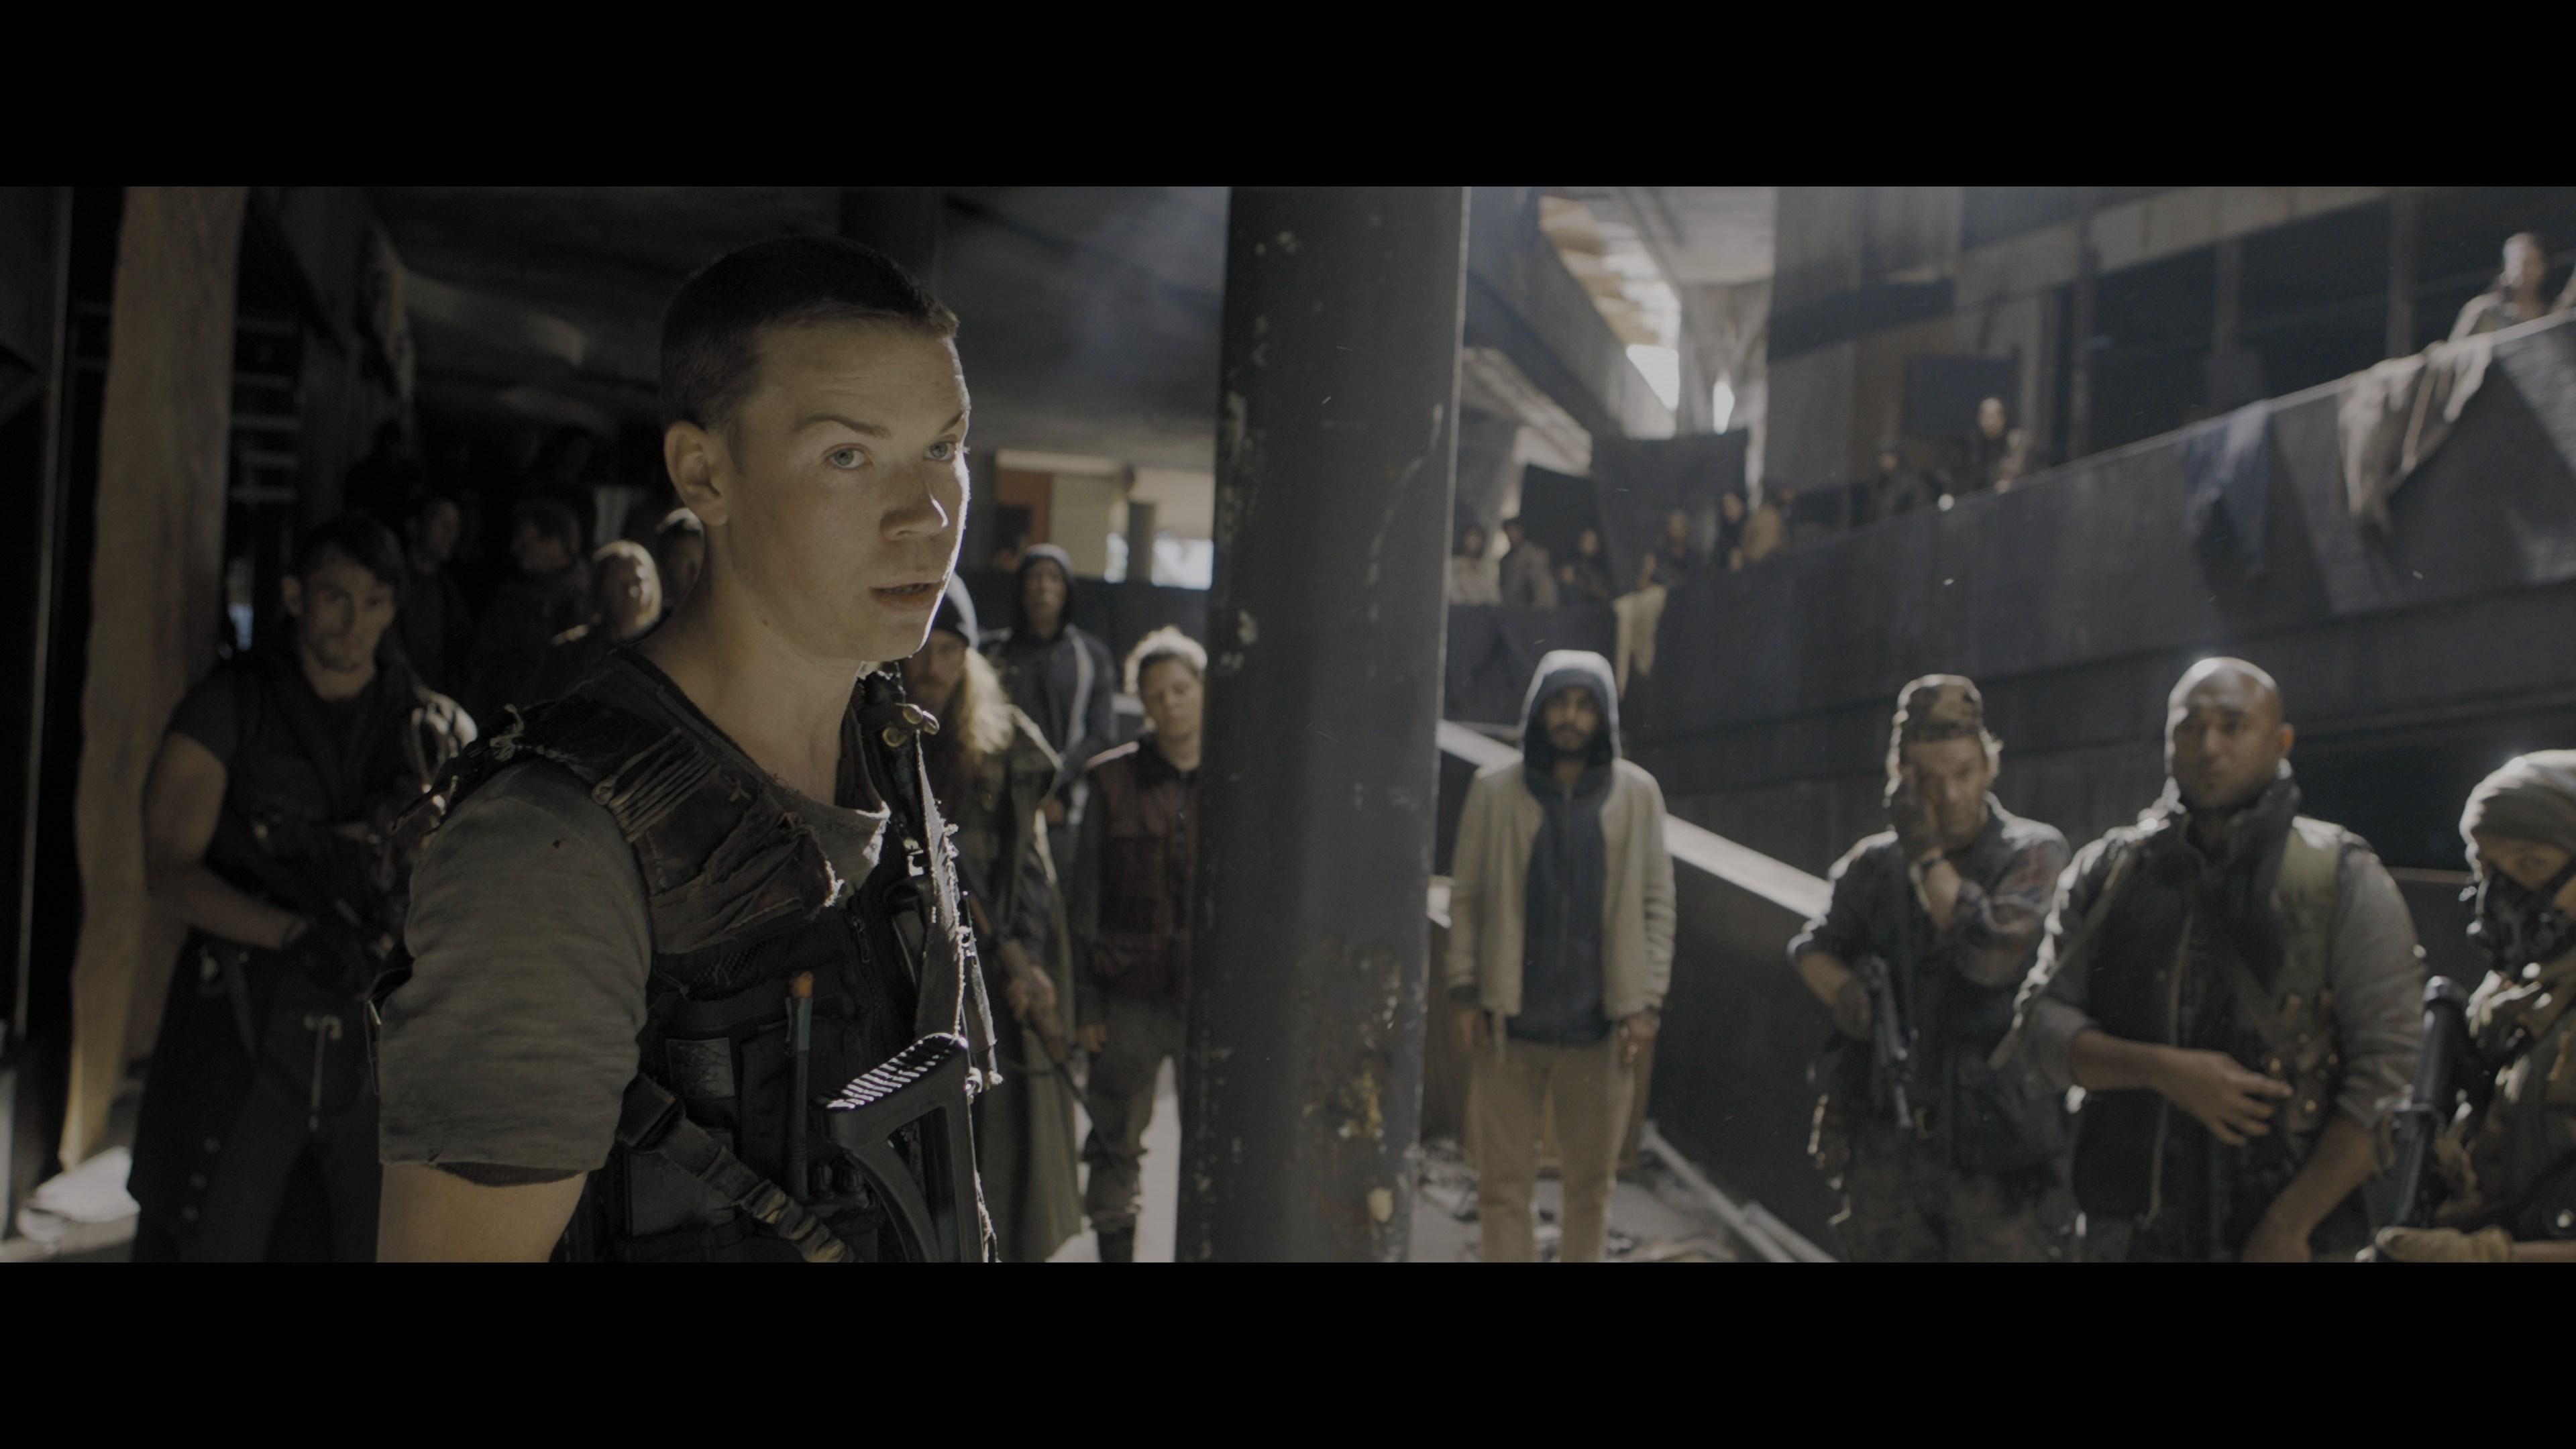 Labirent: Son İsyan - Maze Runner: The Death Cure - 2018 - 2160p - 4K UltraHD HDR HEVC - x265 - DuaL - TR - EN